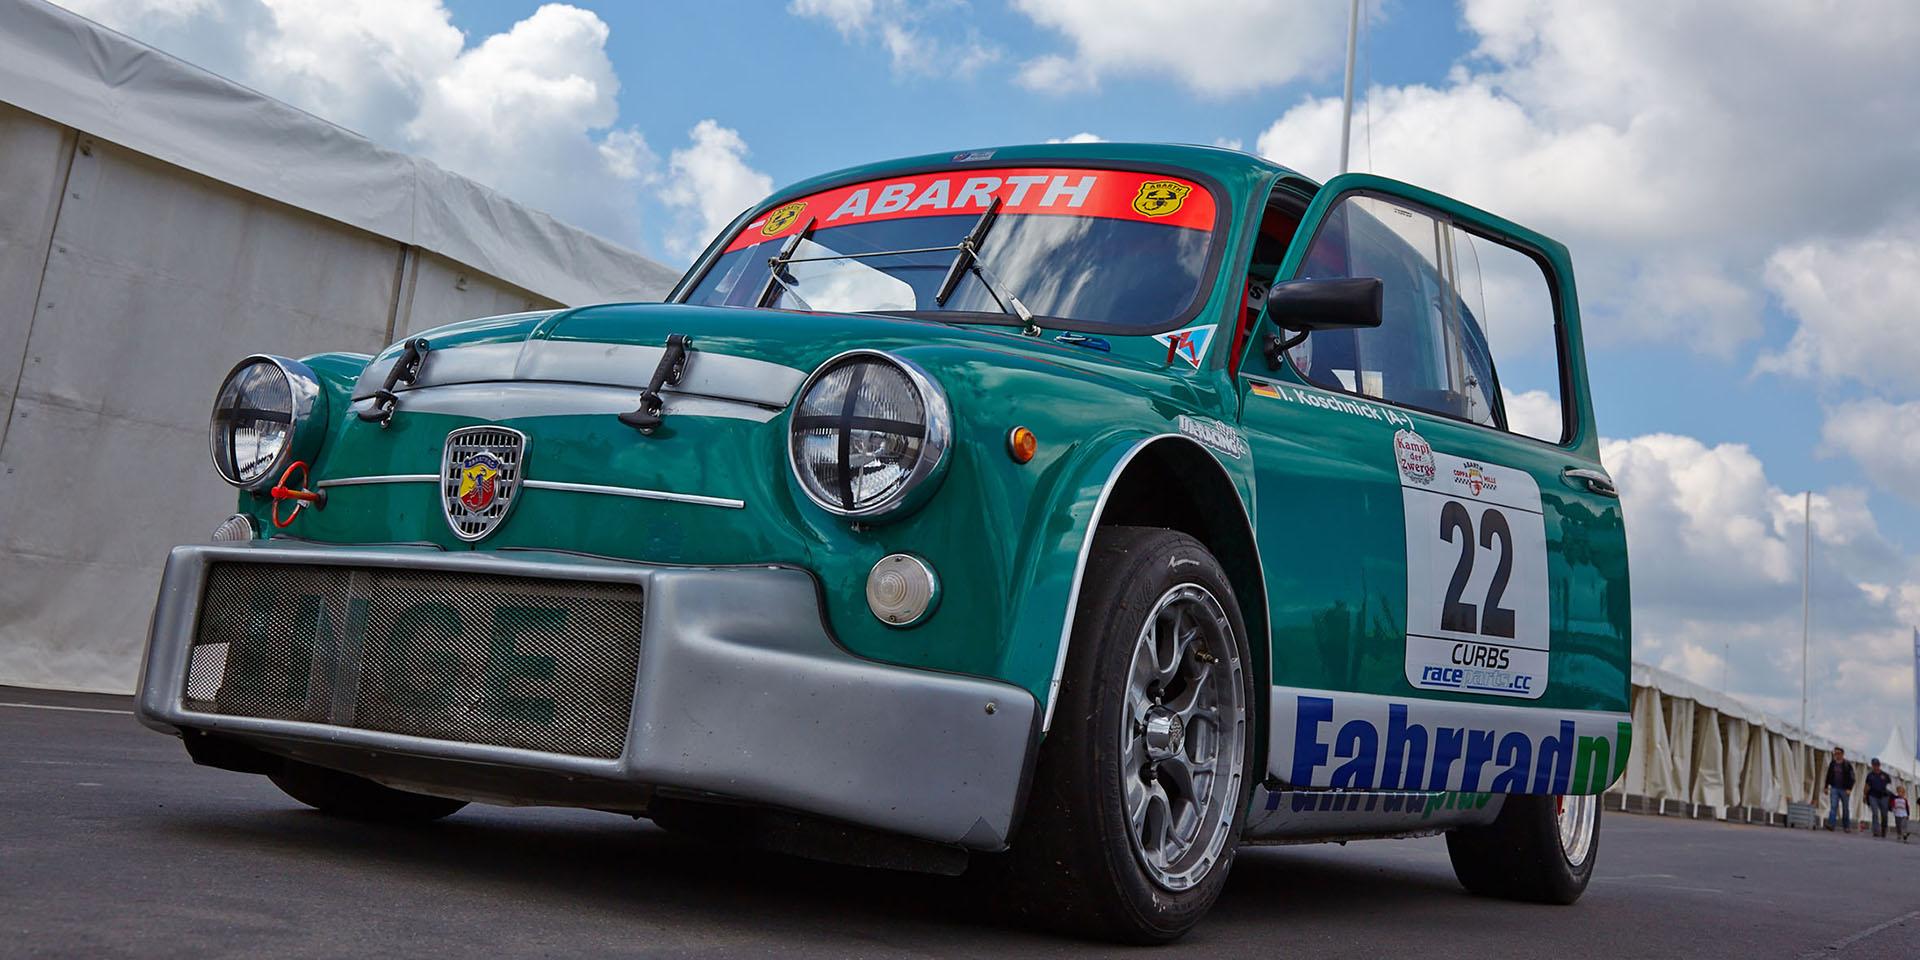 Fotodesign-matthias-schütz-racing-abarth-650